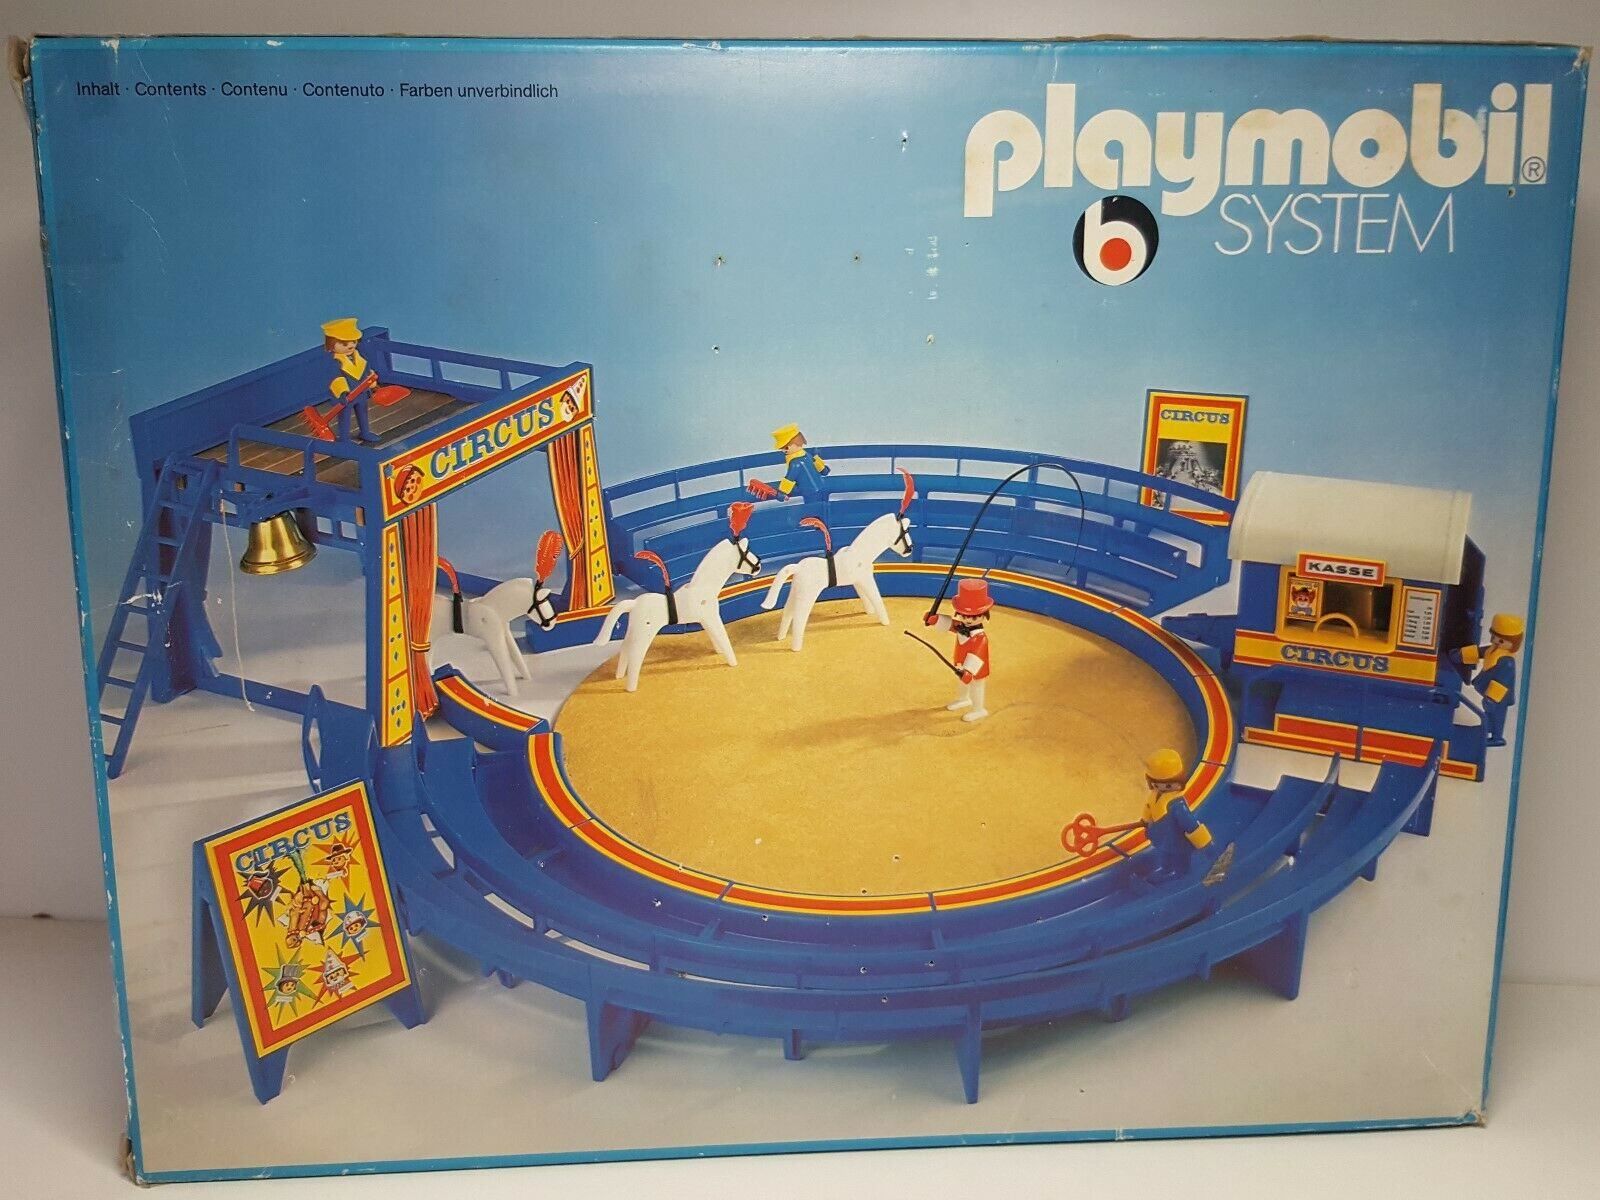 Dificil Raro Primer Circo Antiguo Playmobil System 3510 Completo Caja Circus